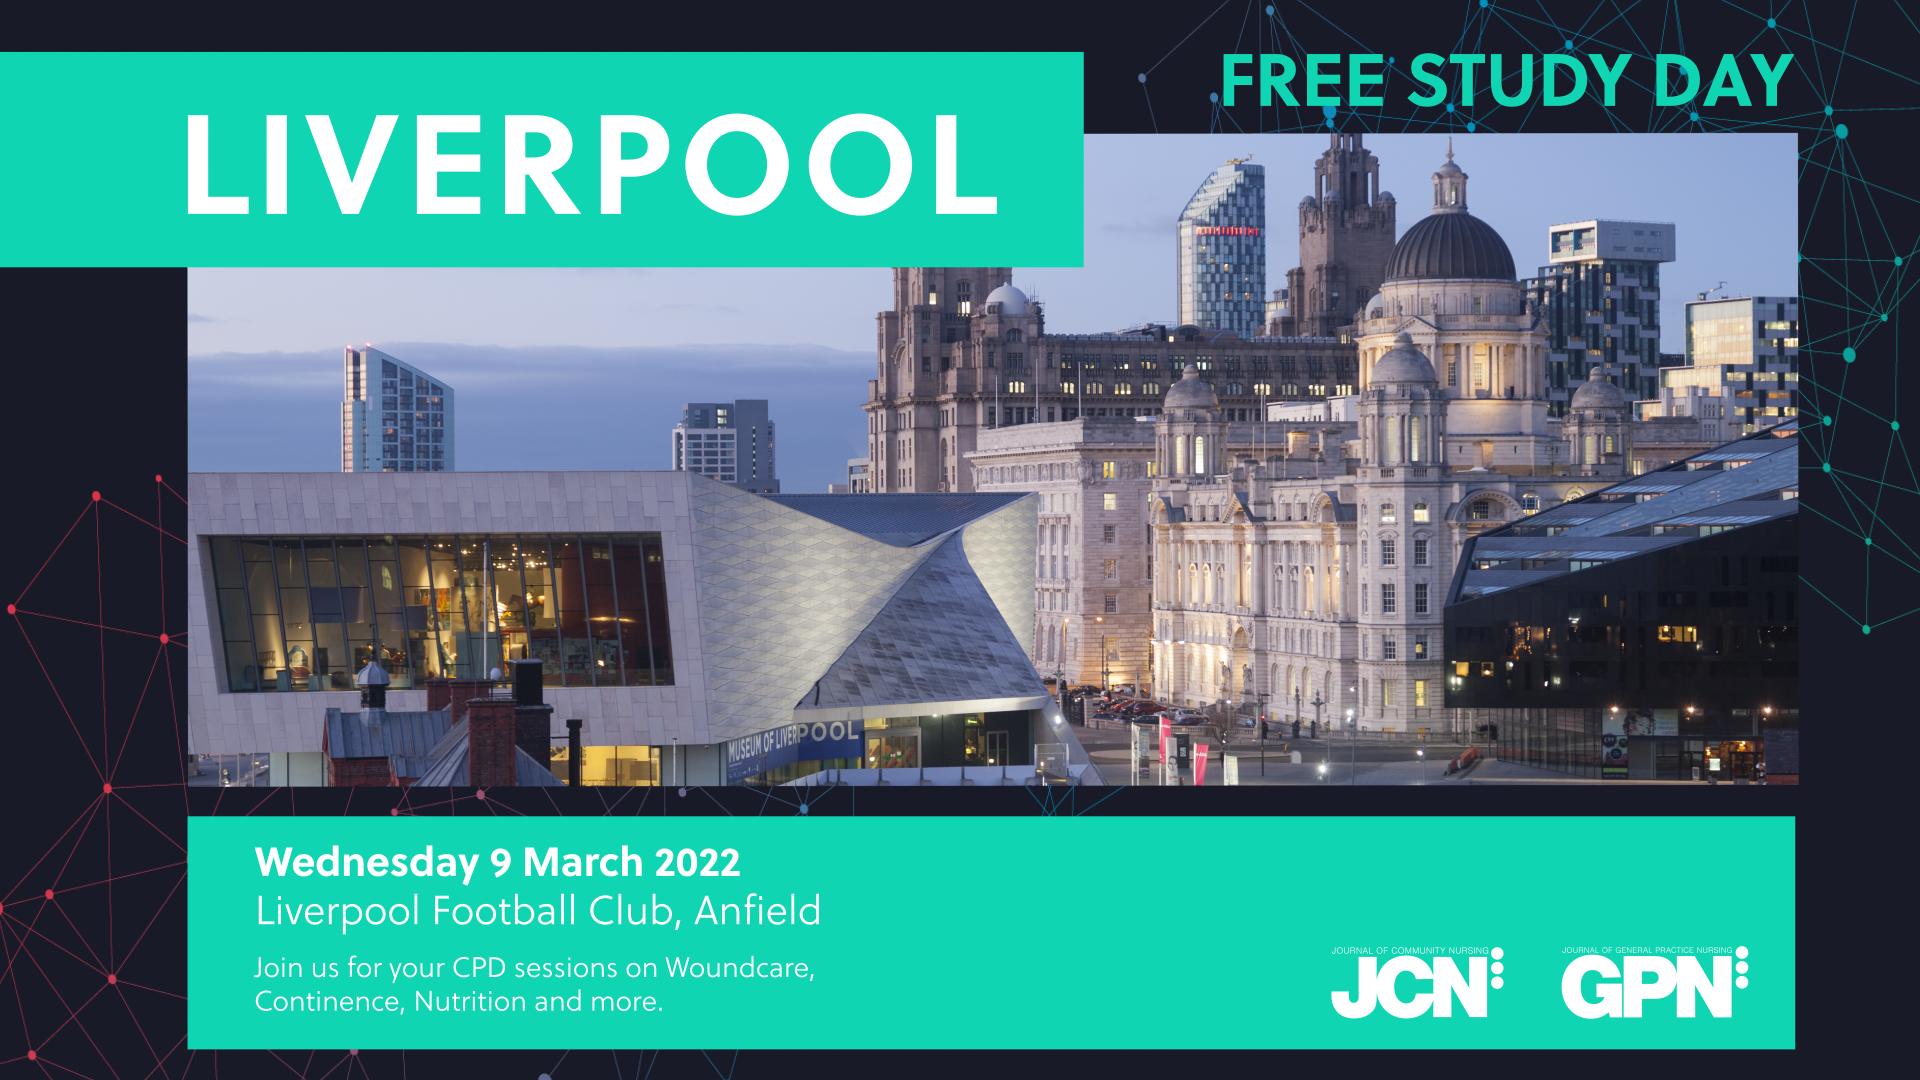 JCN Study Day Liverpool